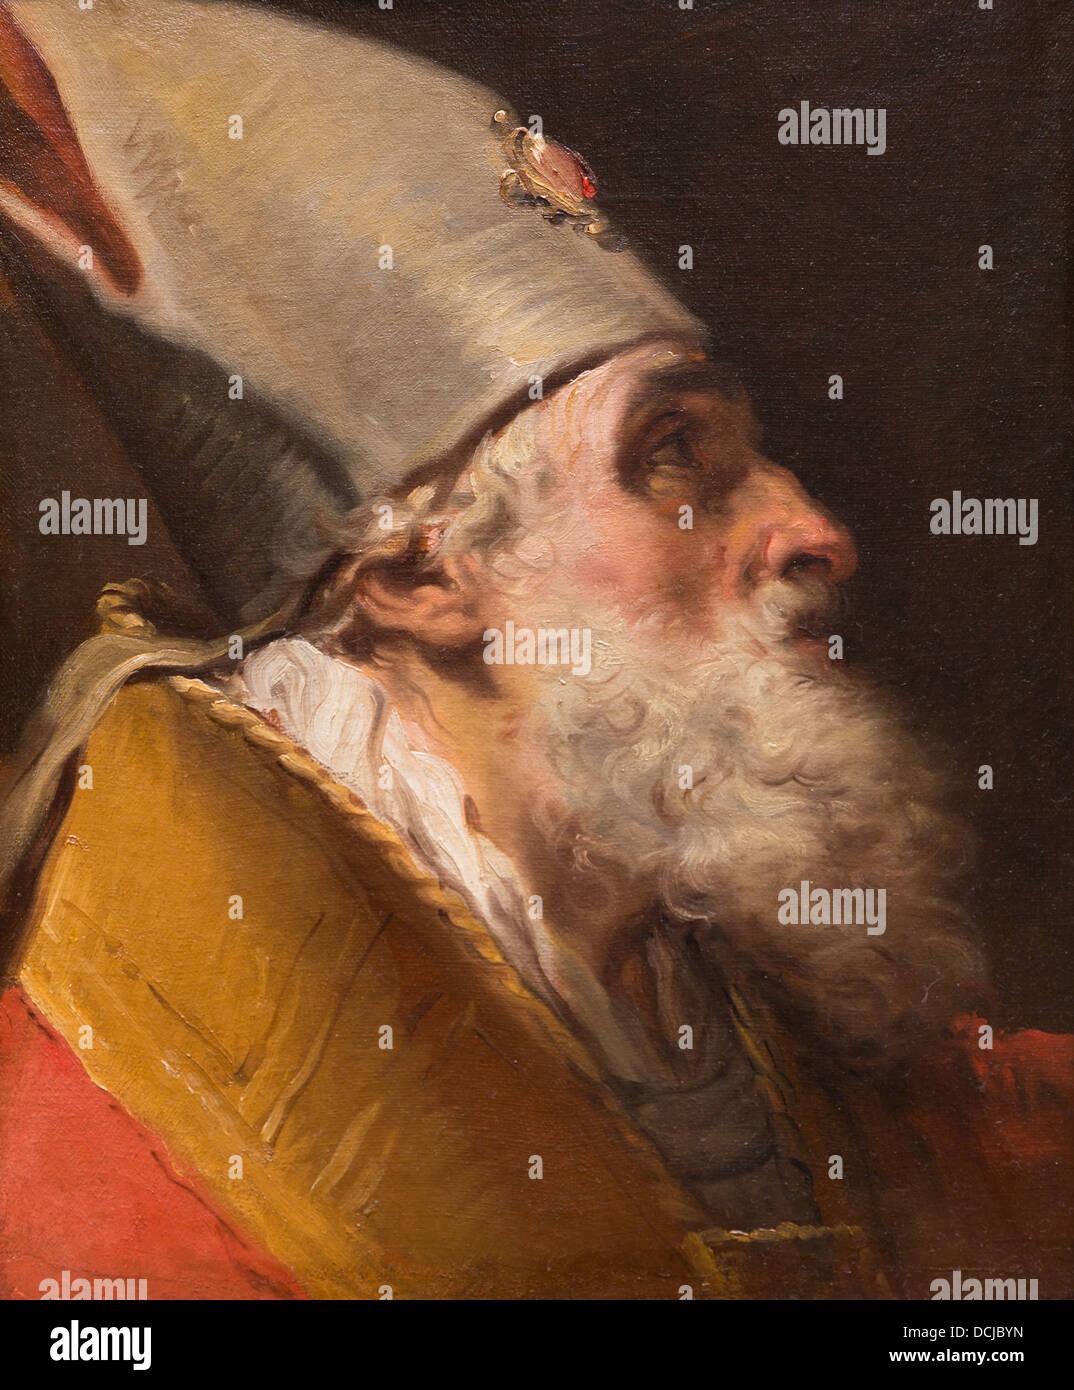 18th century  -  Head of a Bishop, 1770 - Gaetano Gandolfi Philippe Sauvan-Magnet / Active Museum - Stock Image